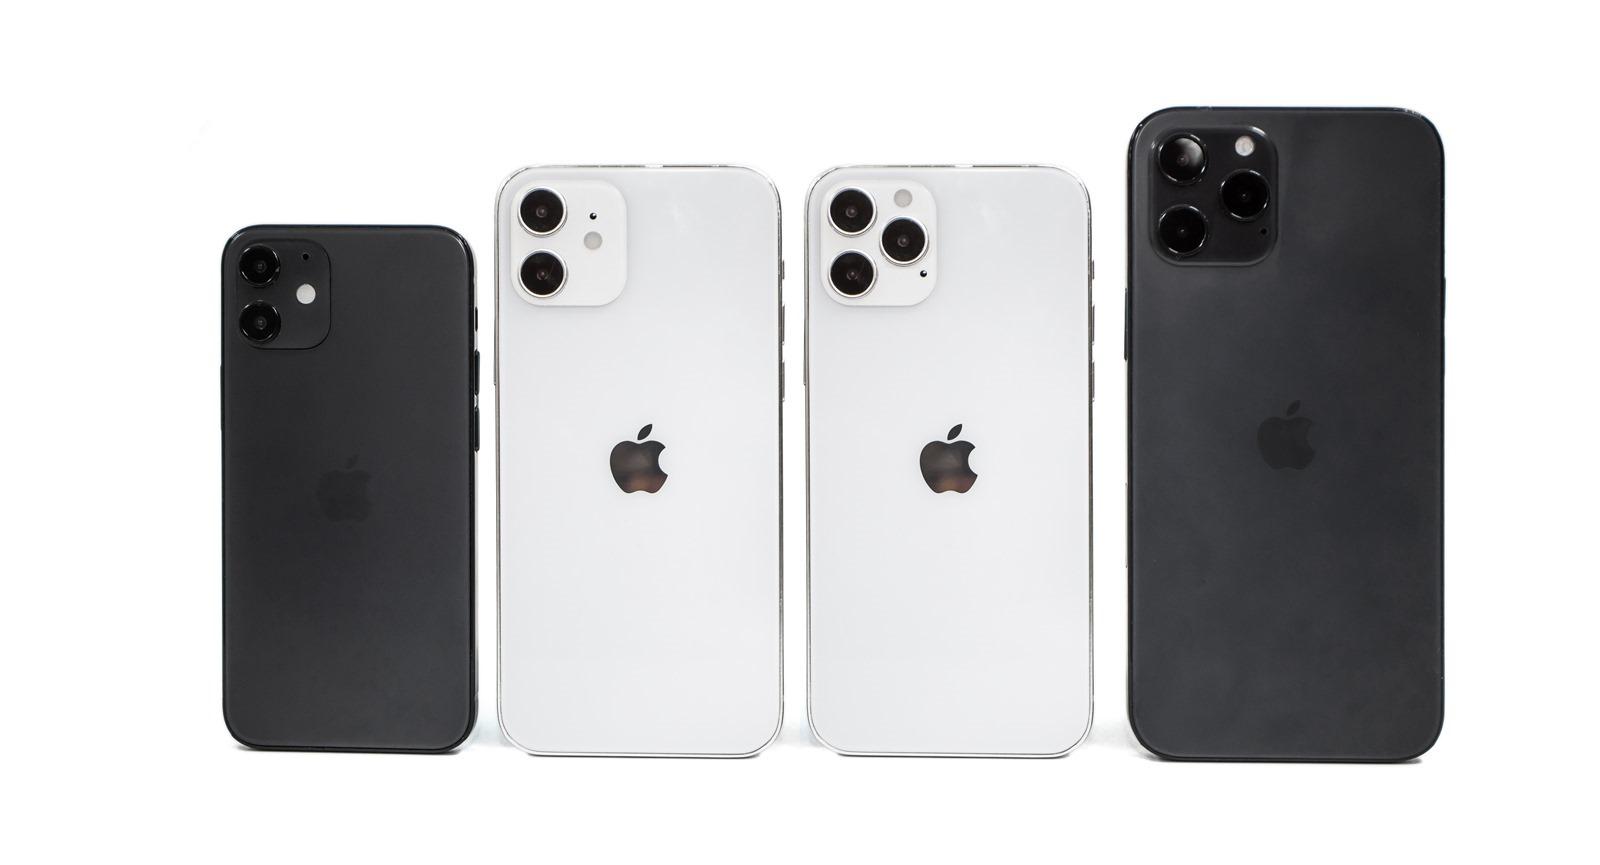 iPhone 12 長這樣?最終模型機分享 + 阿輝個人看法 @3C 達人廖阿輝